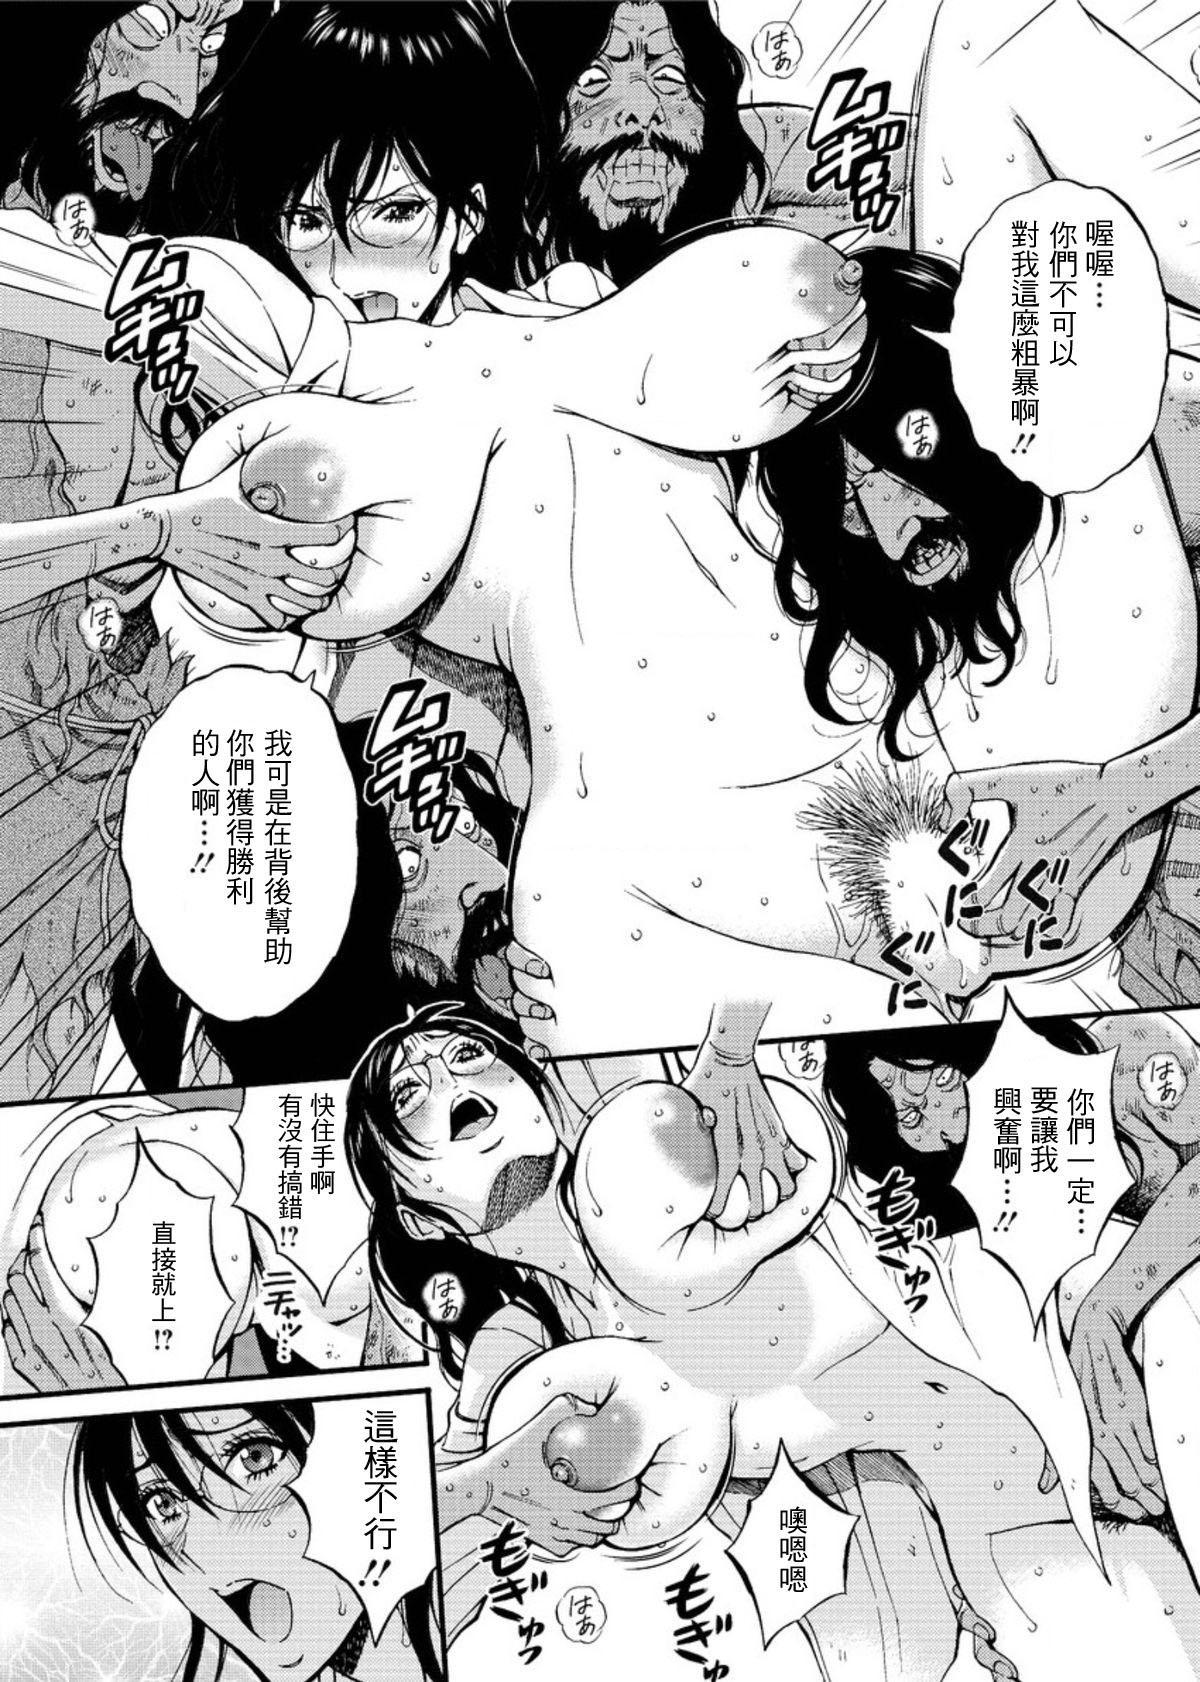 Kigenzen 10000 Nen no Ota | 史前一萬年的宅男 Ch. 19-24 97